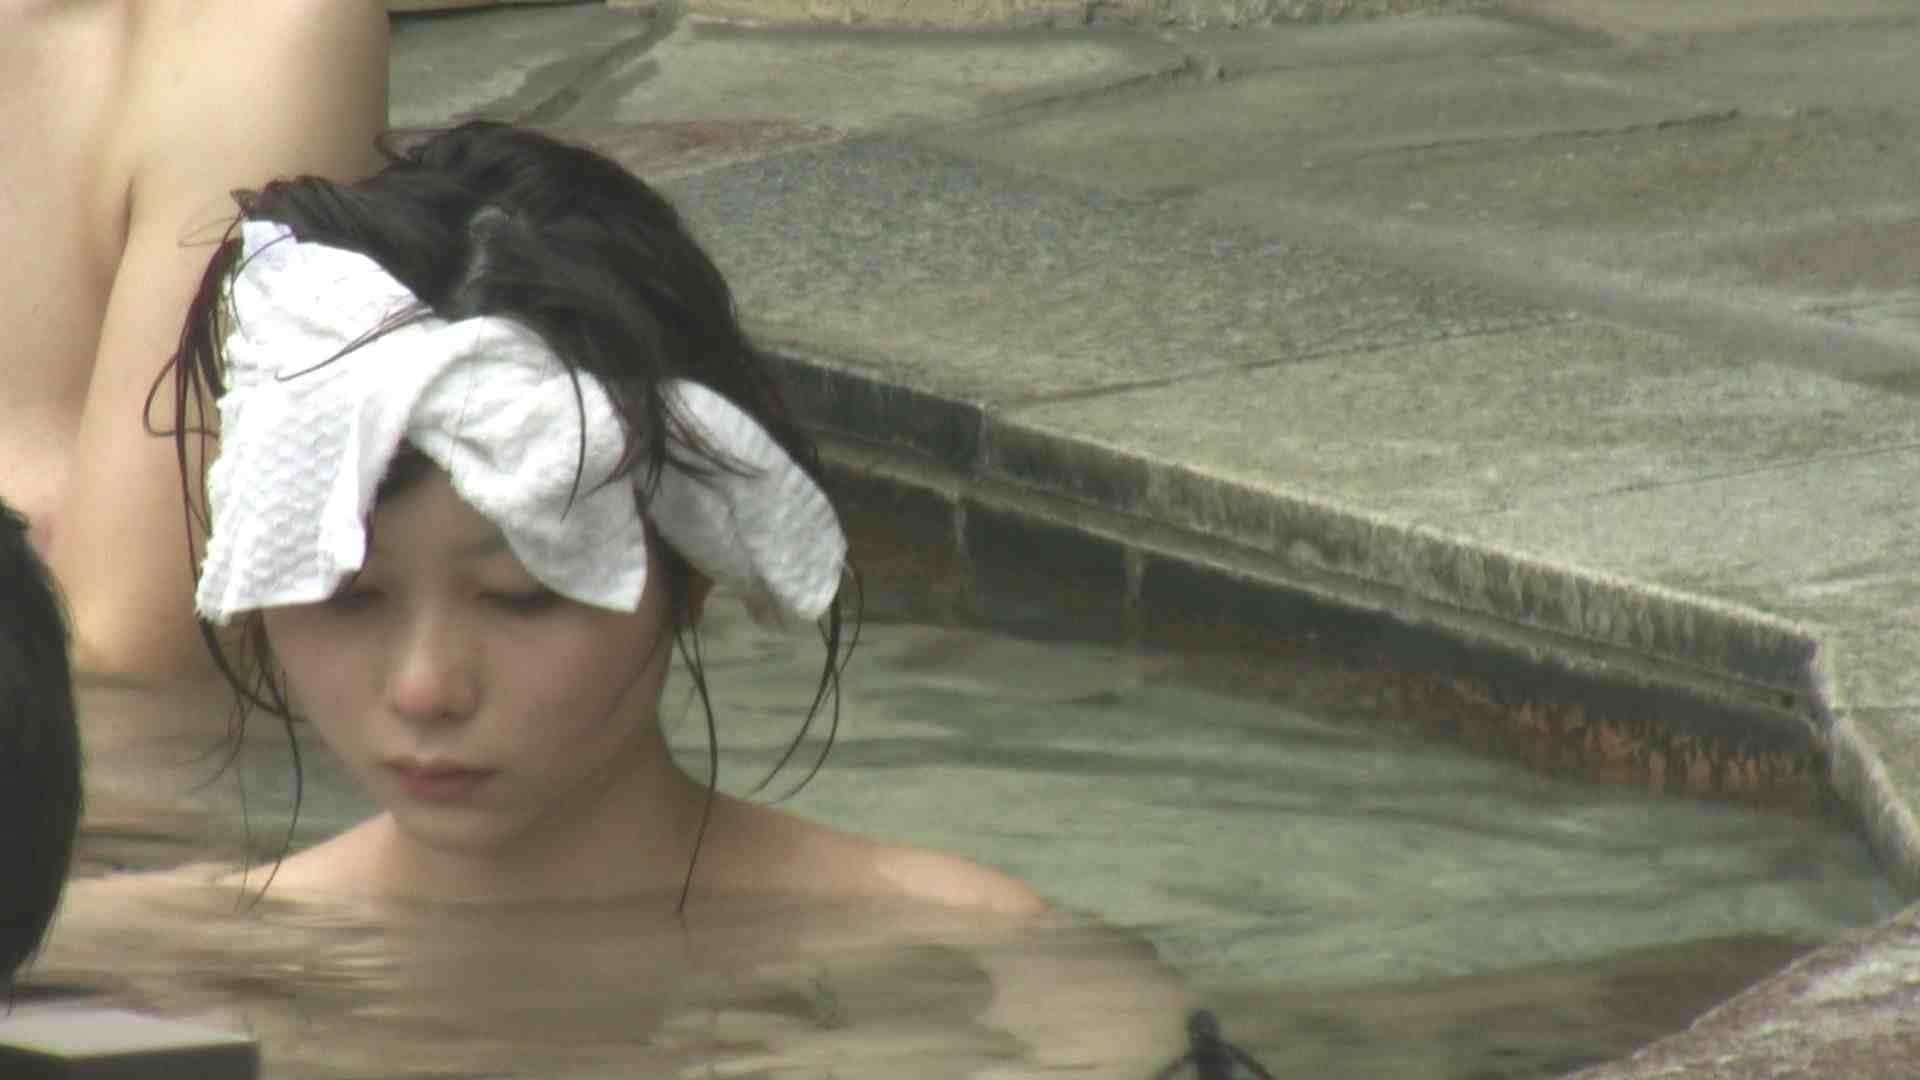 Aquaな露天風呂Vol.147 露天 濡れ場動画紹介 85画像 14